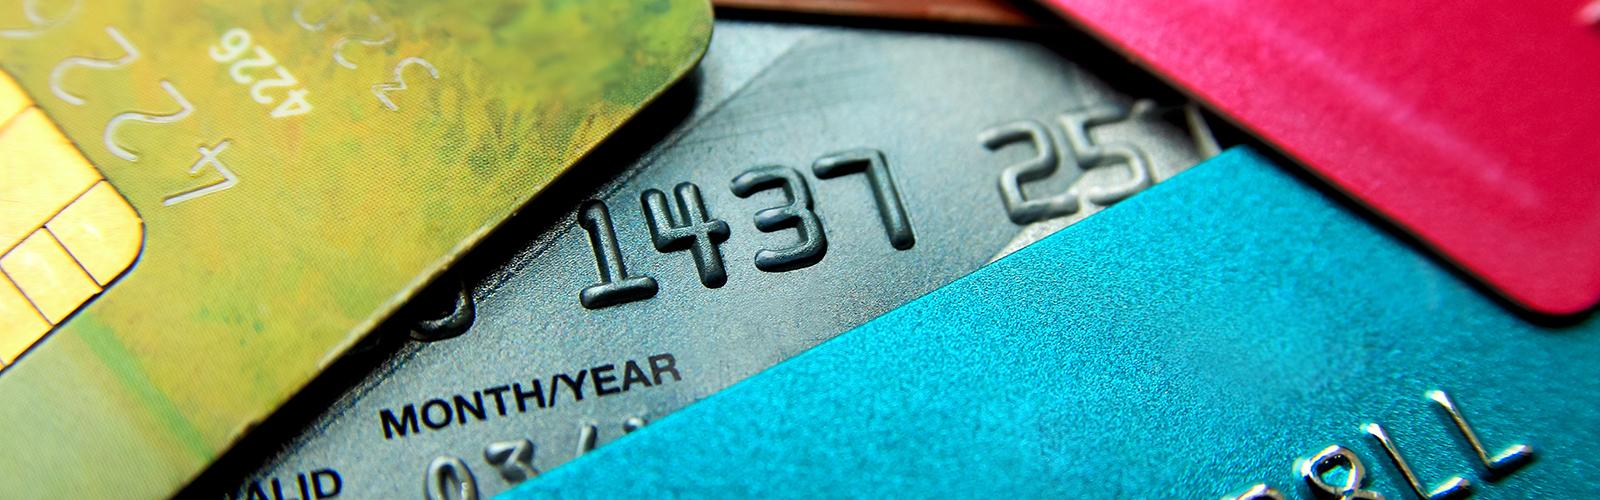 Colourful debit cards